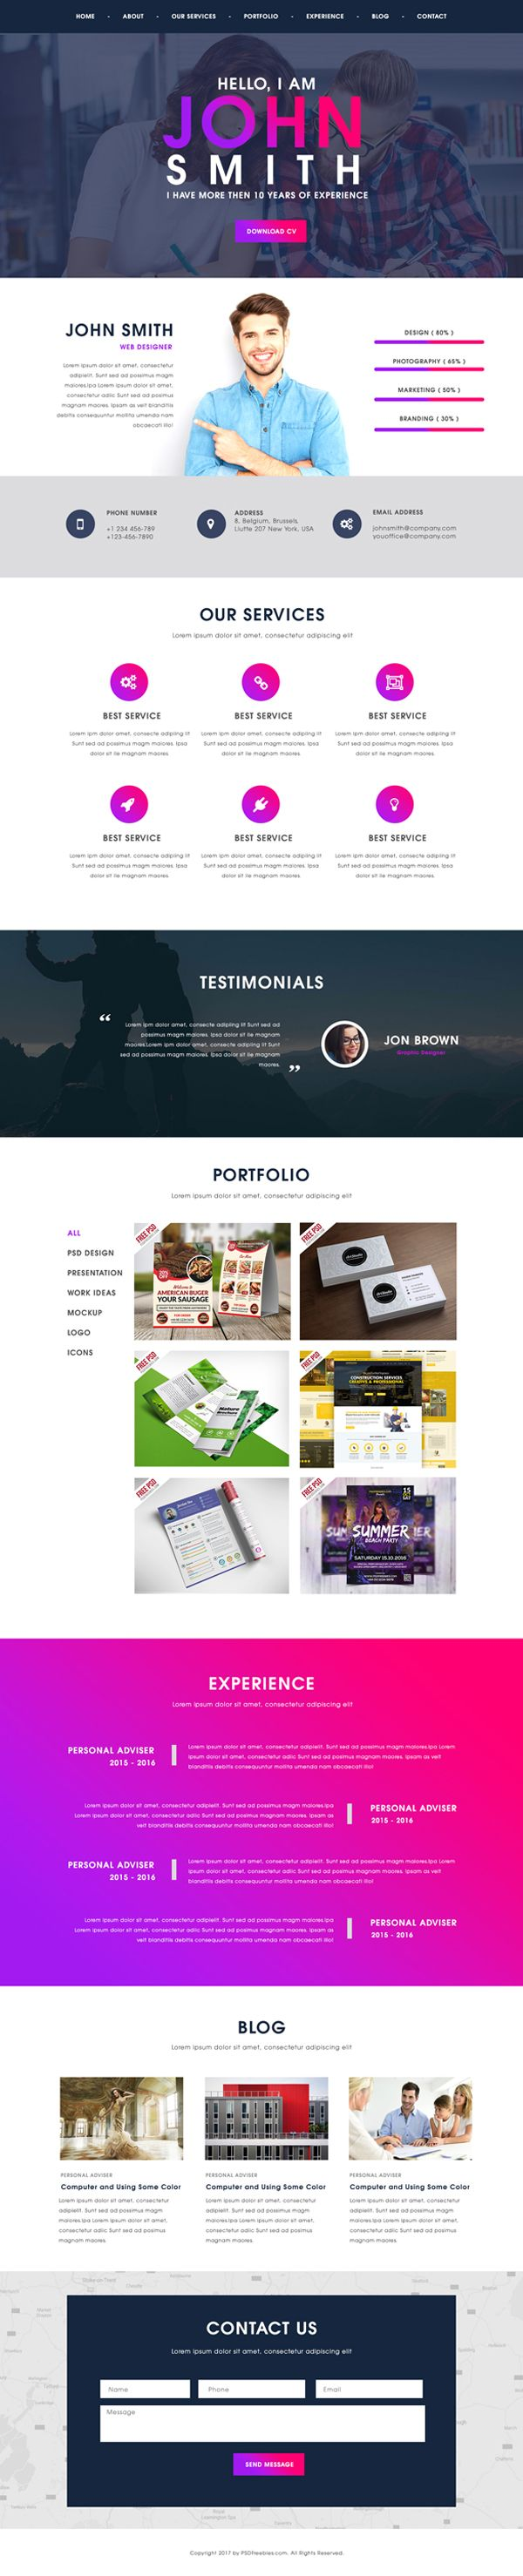 Free photo portfolio website